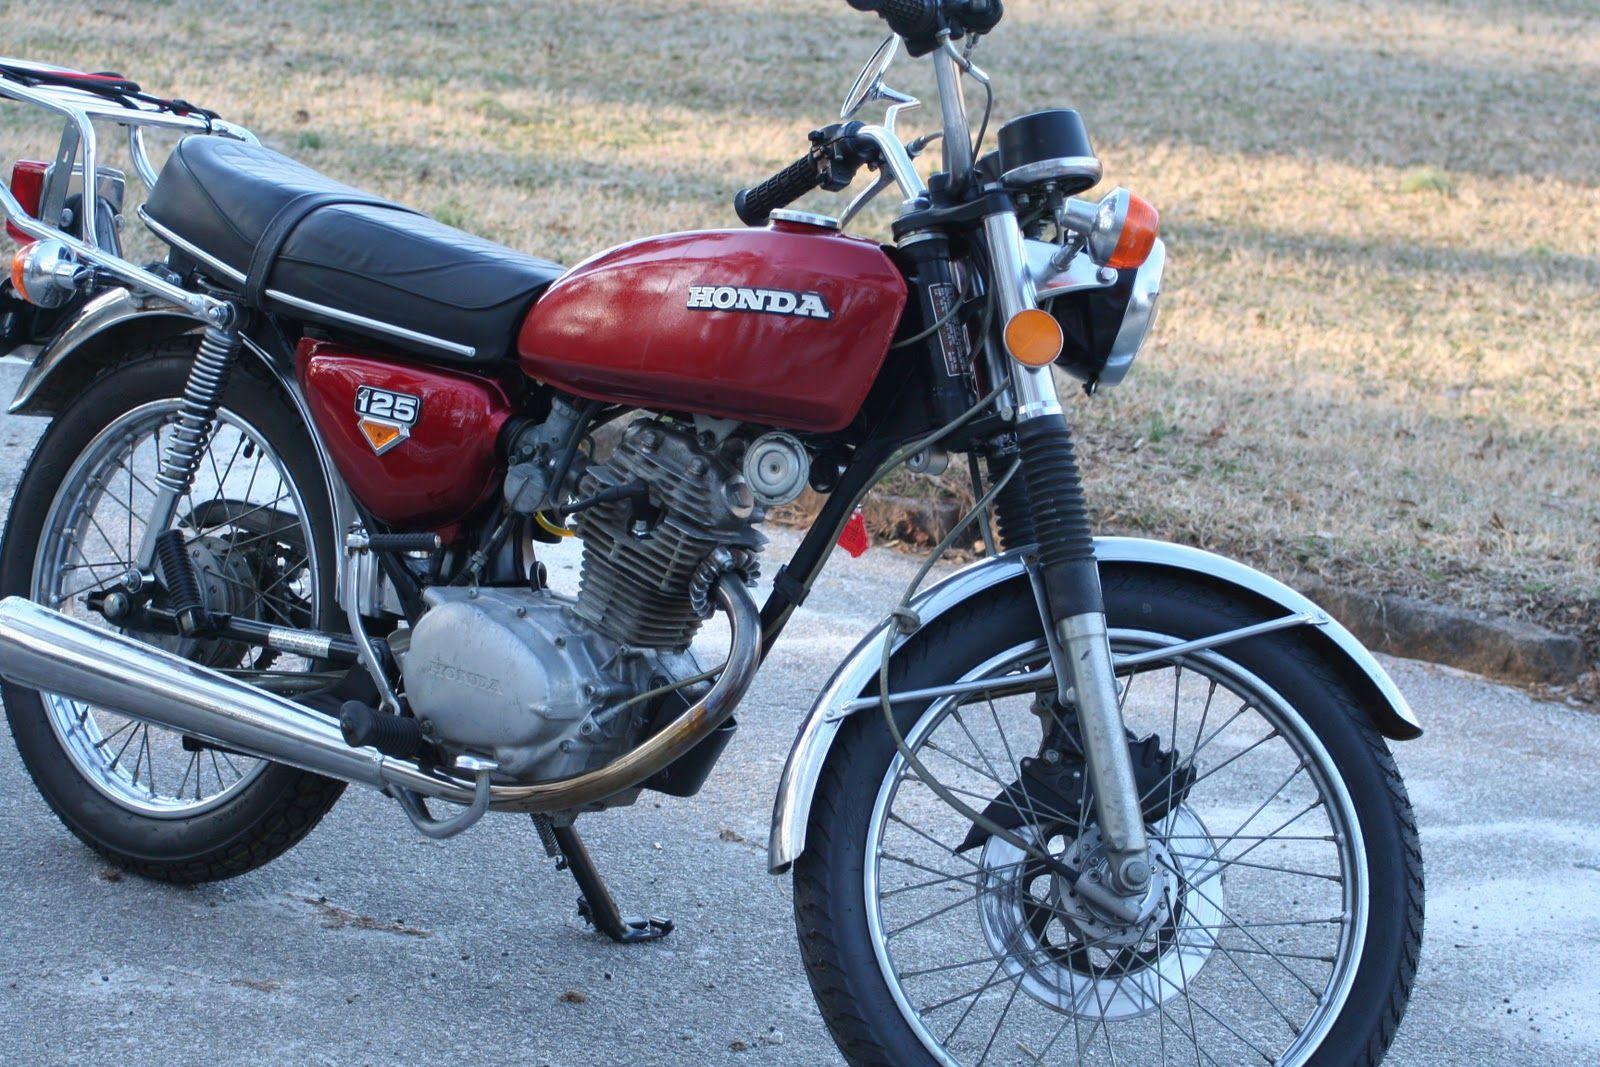 1970 39 S Honda Motorcycle Honda Motorcycles Pinterest